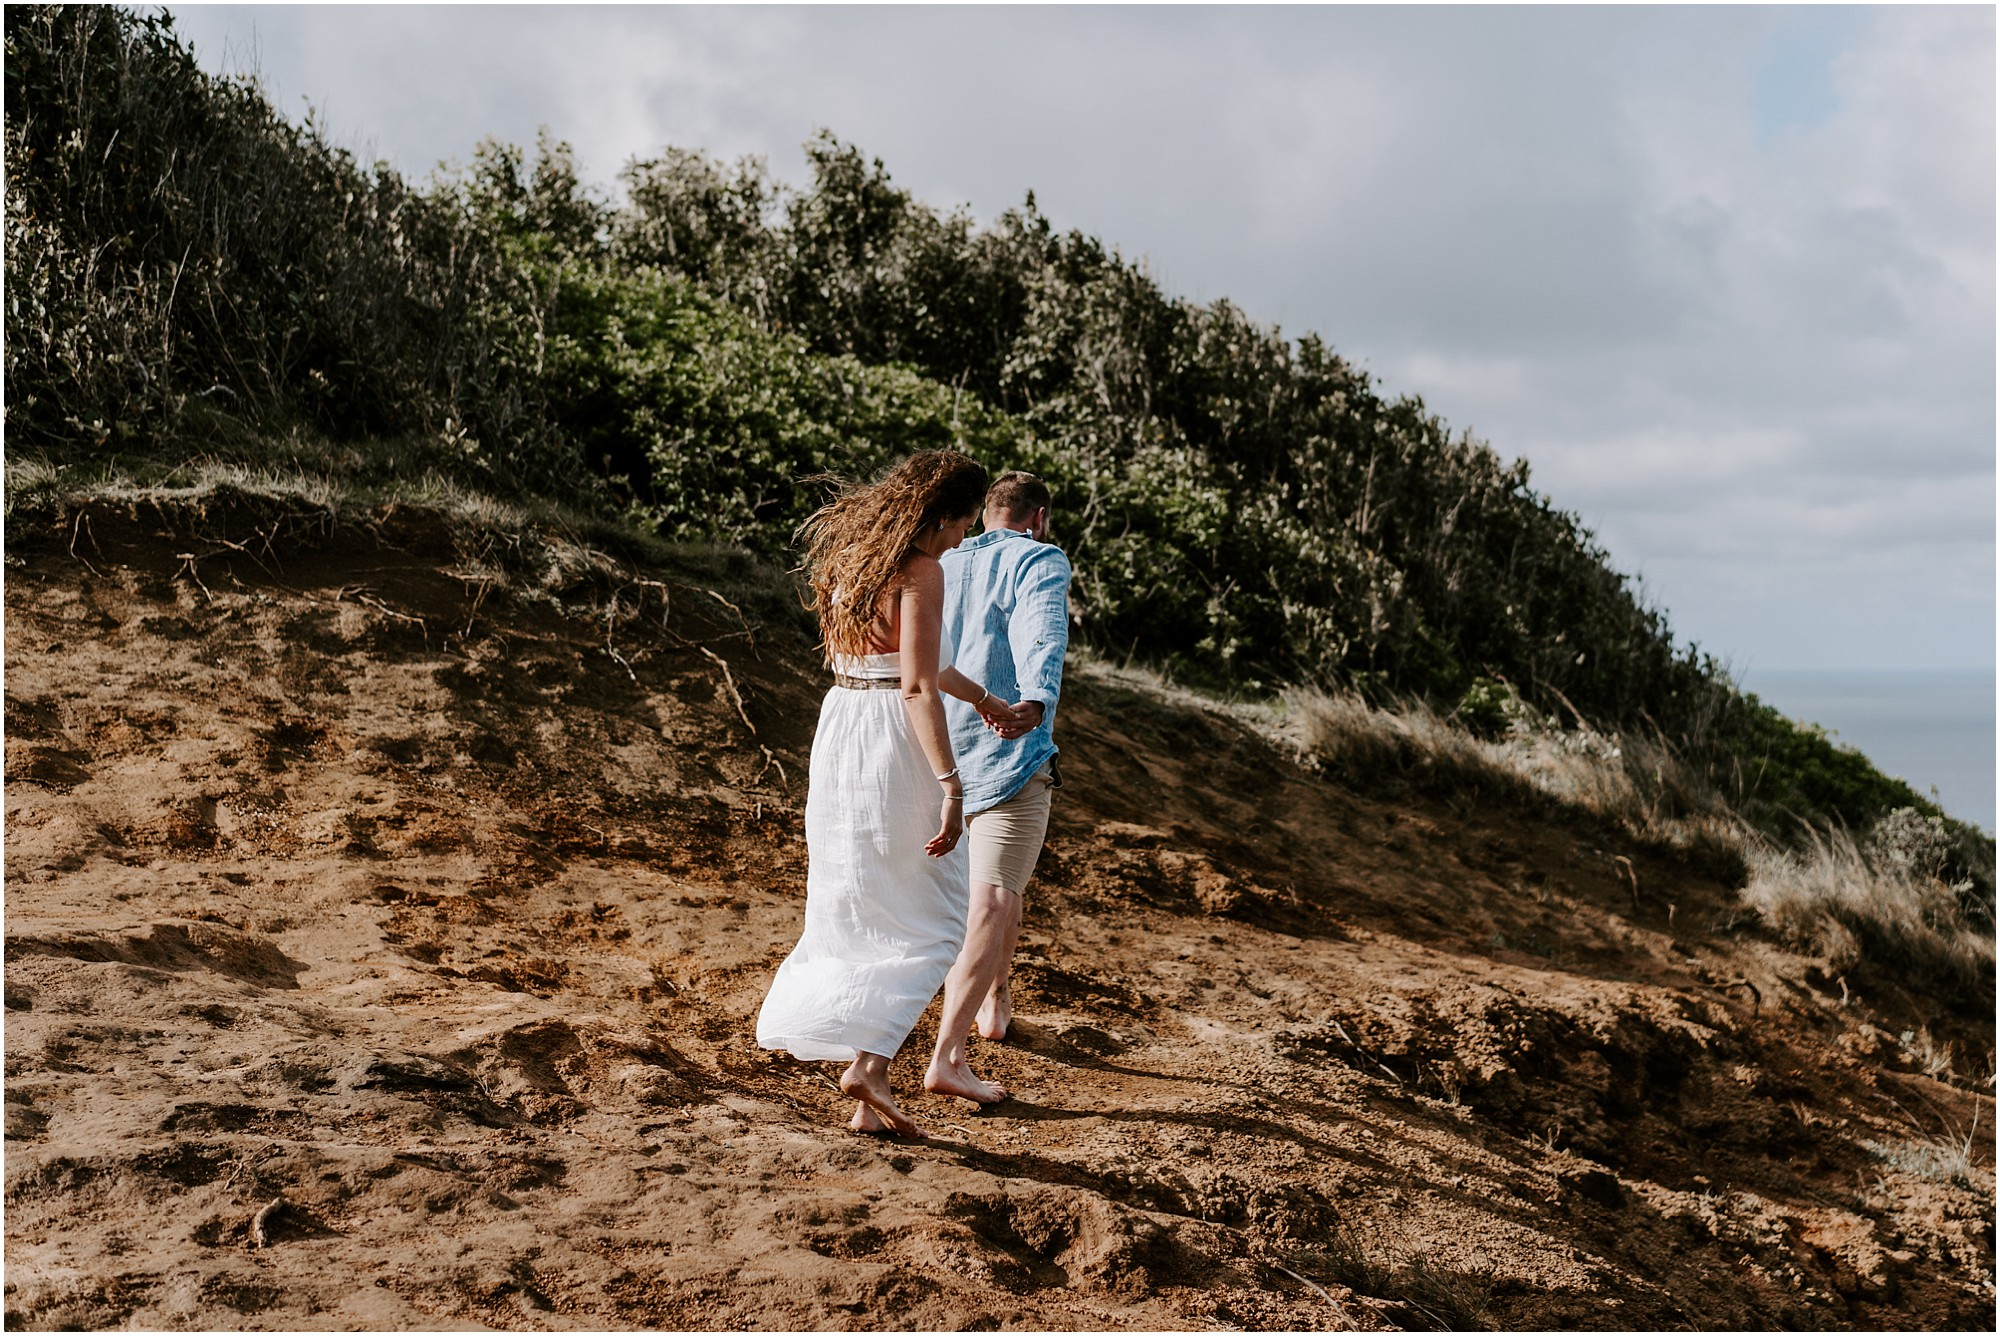 big-island-valley-proposal-hawaii-elopement-photographer_0001.jpg